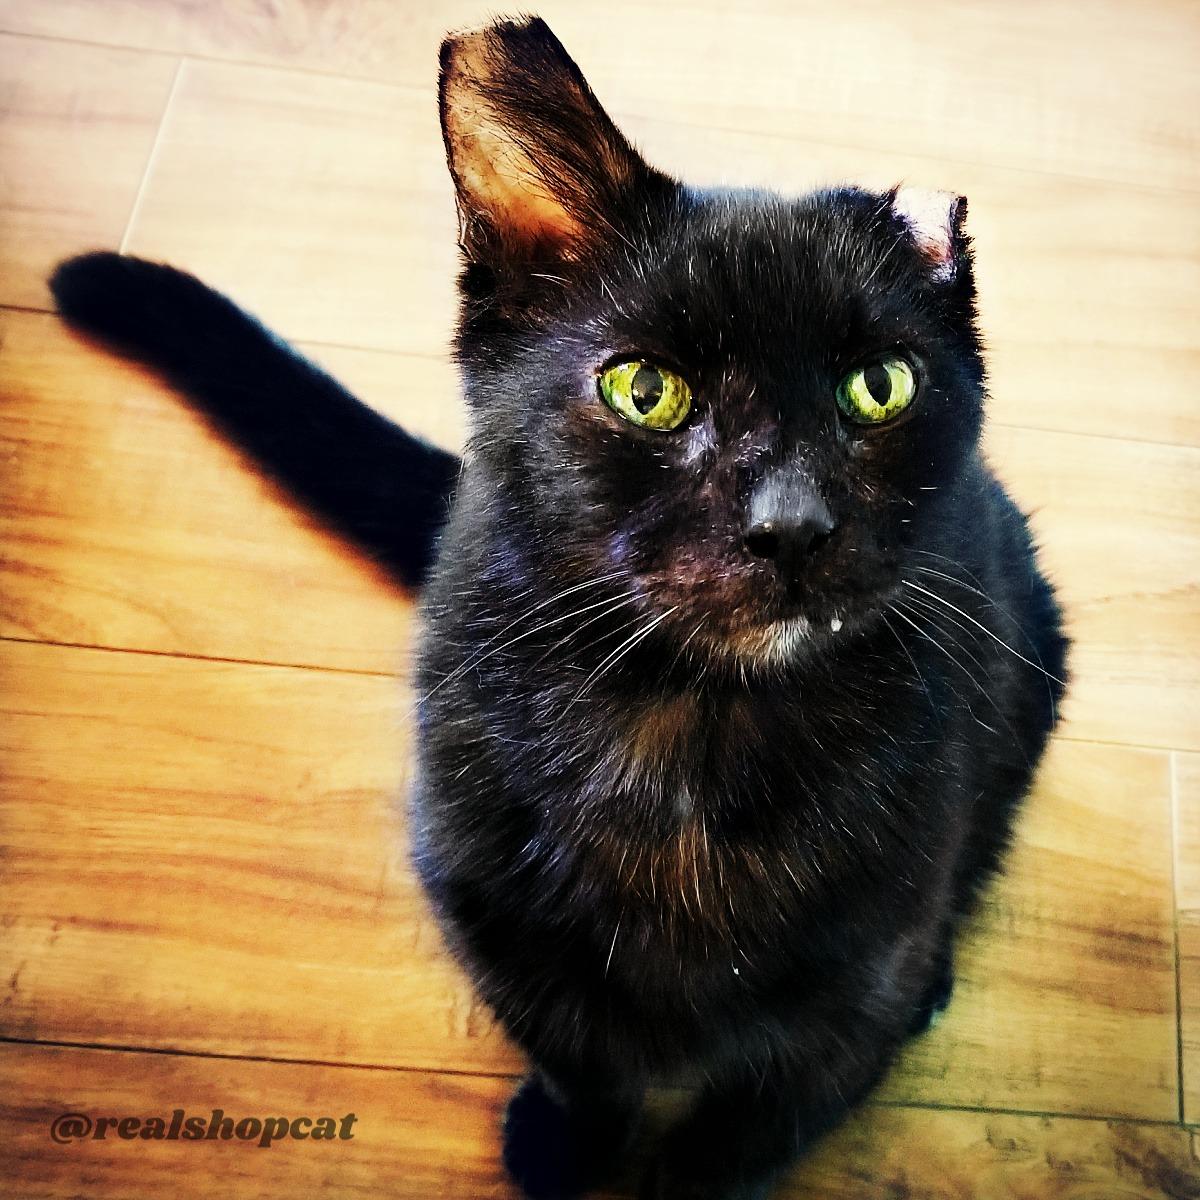 shoppy-realshopcat_adopt_seniors_pet_month Real Shop Cat Inspires Senior Adoption